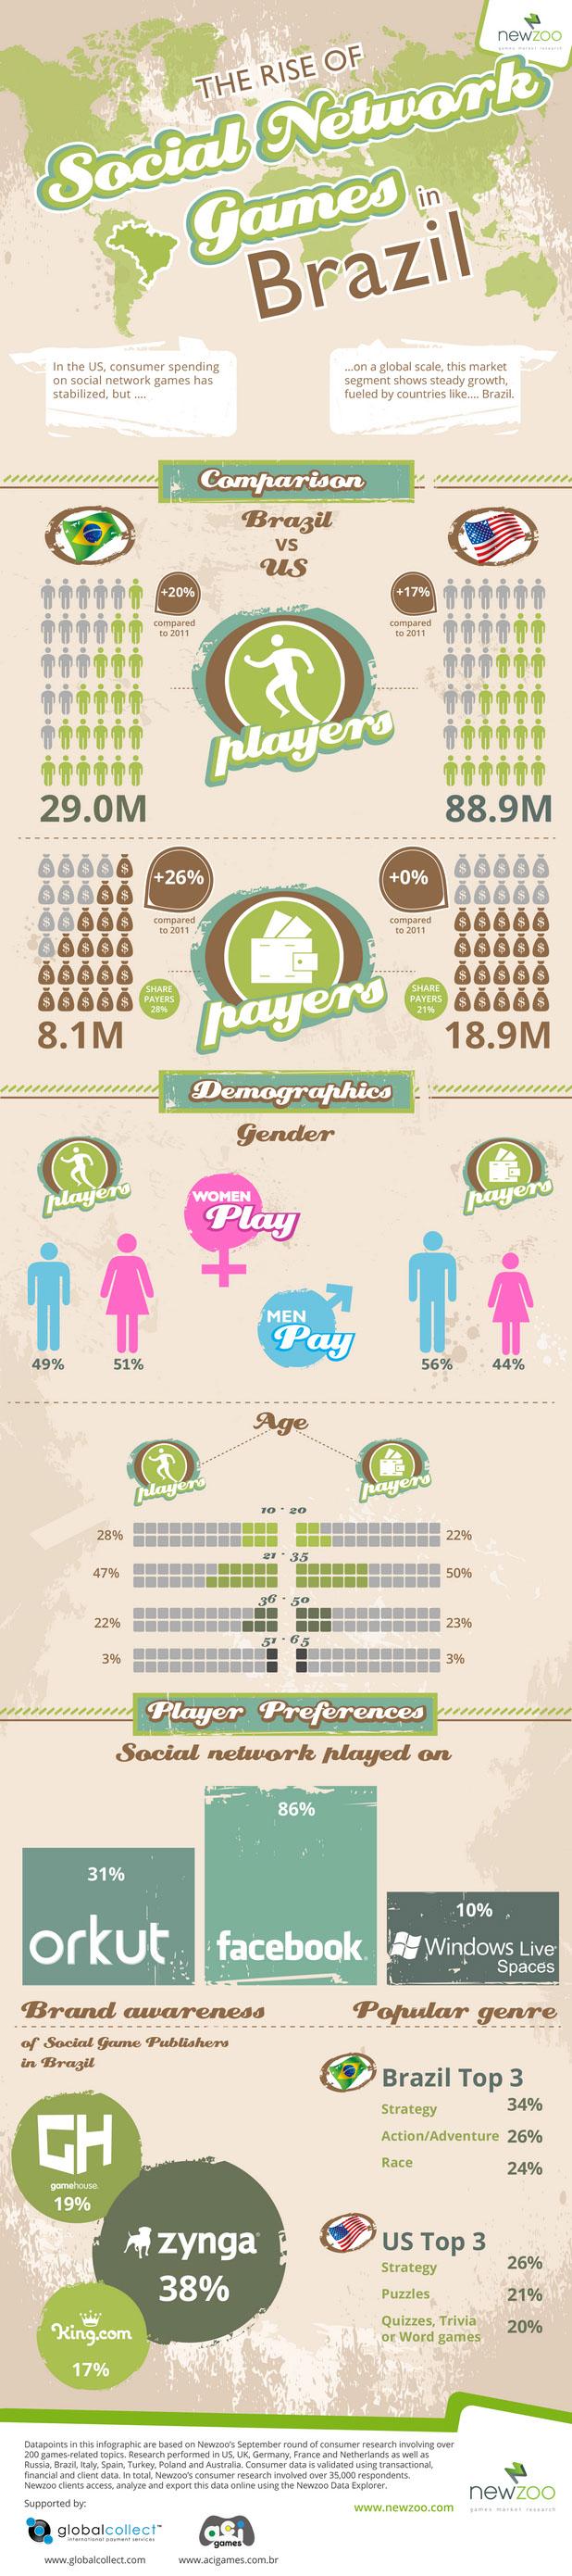 Social Gaming in Brazil-Infographic